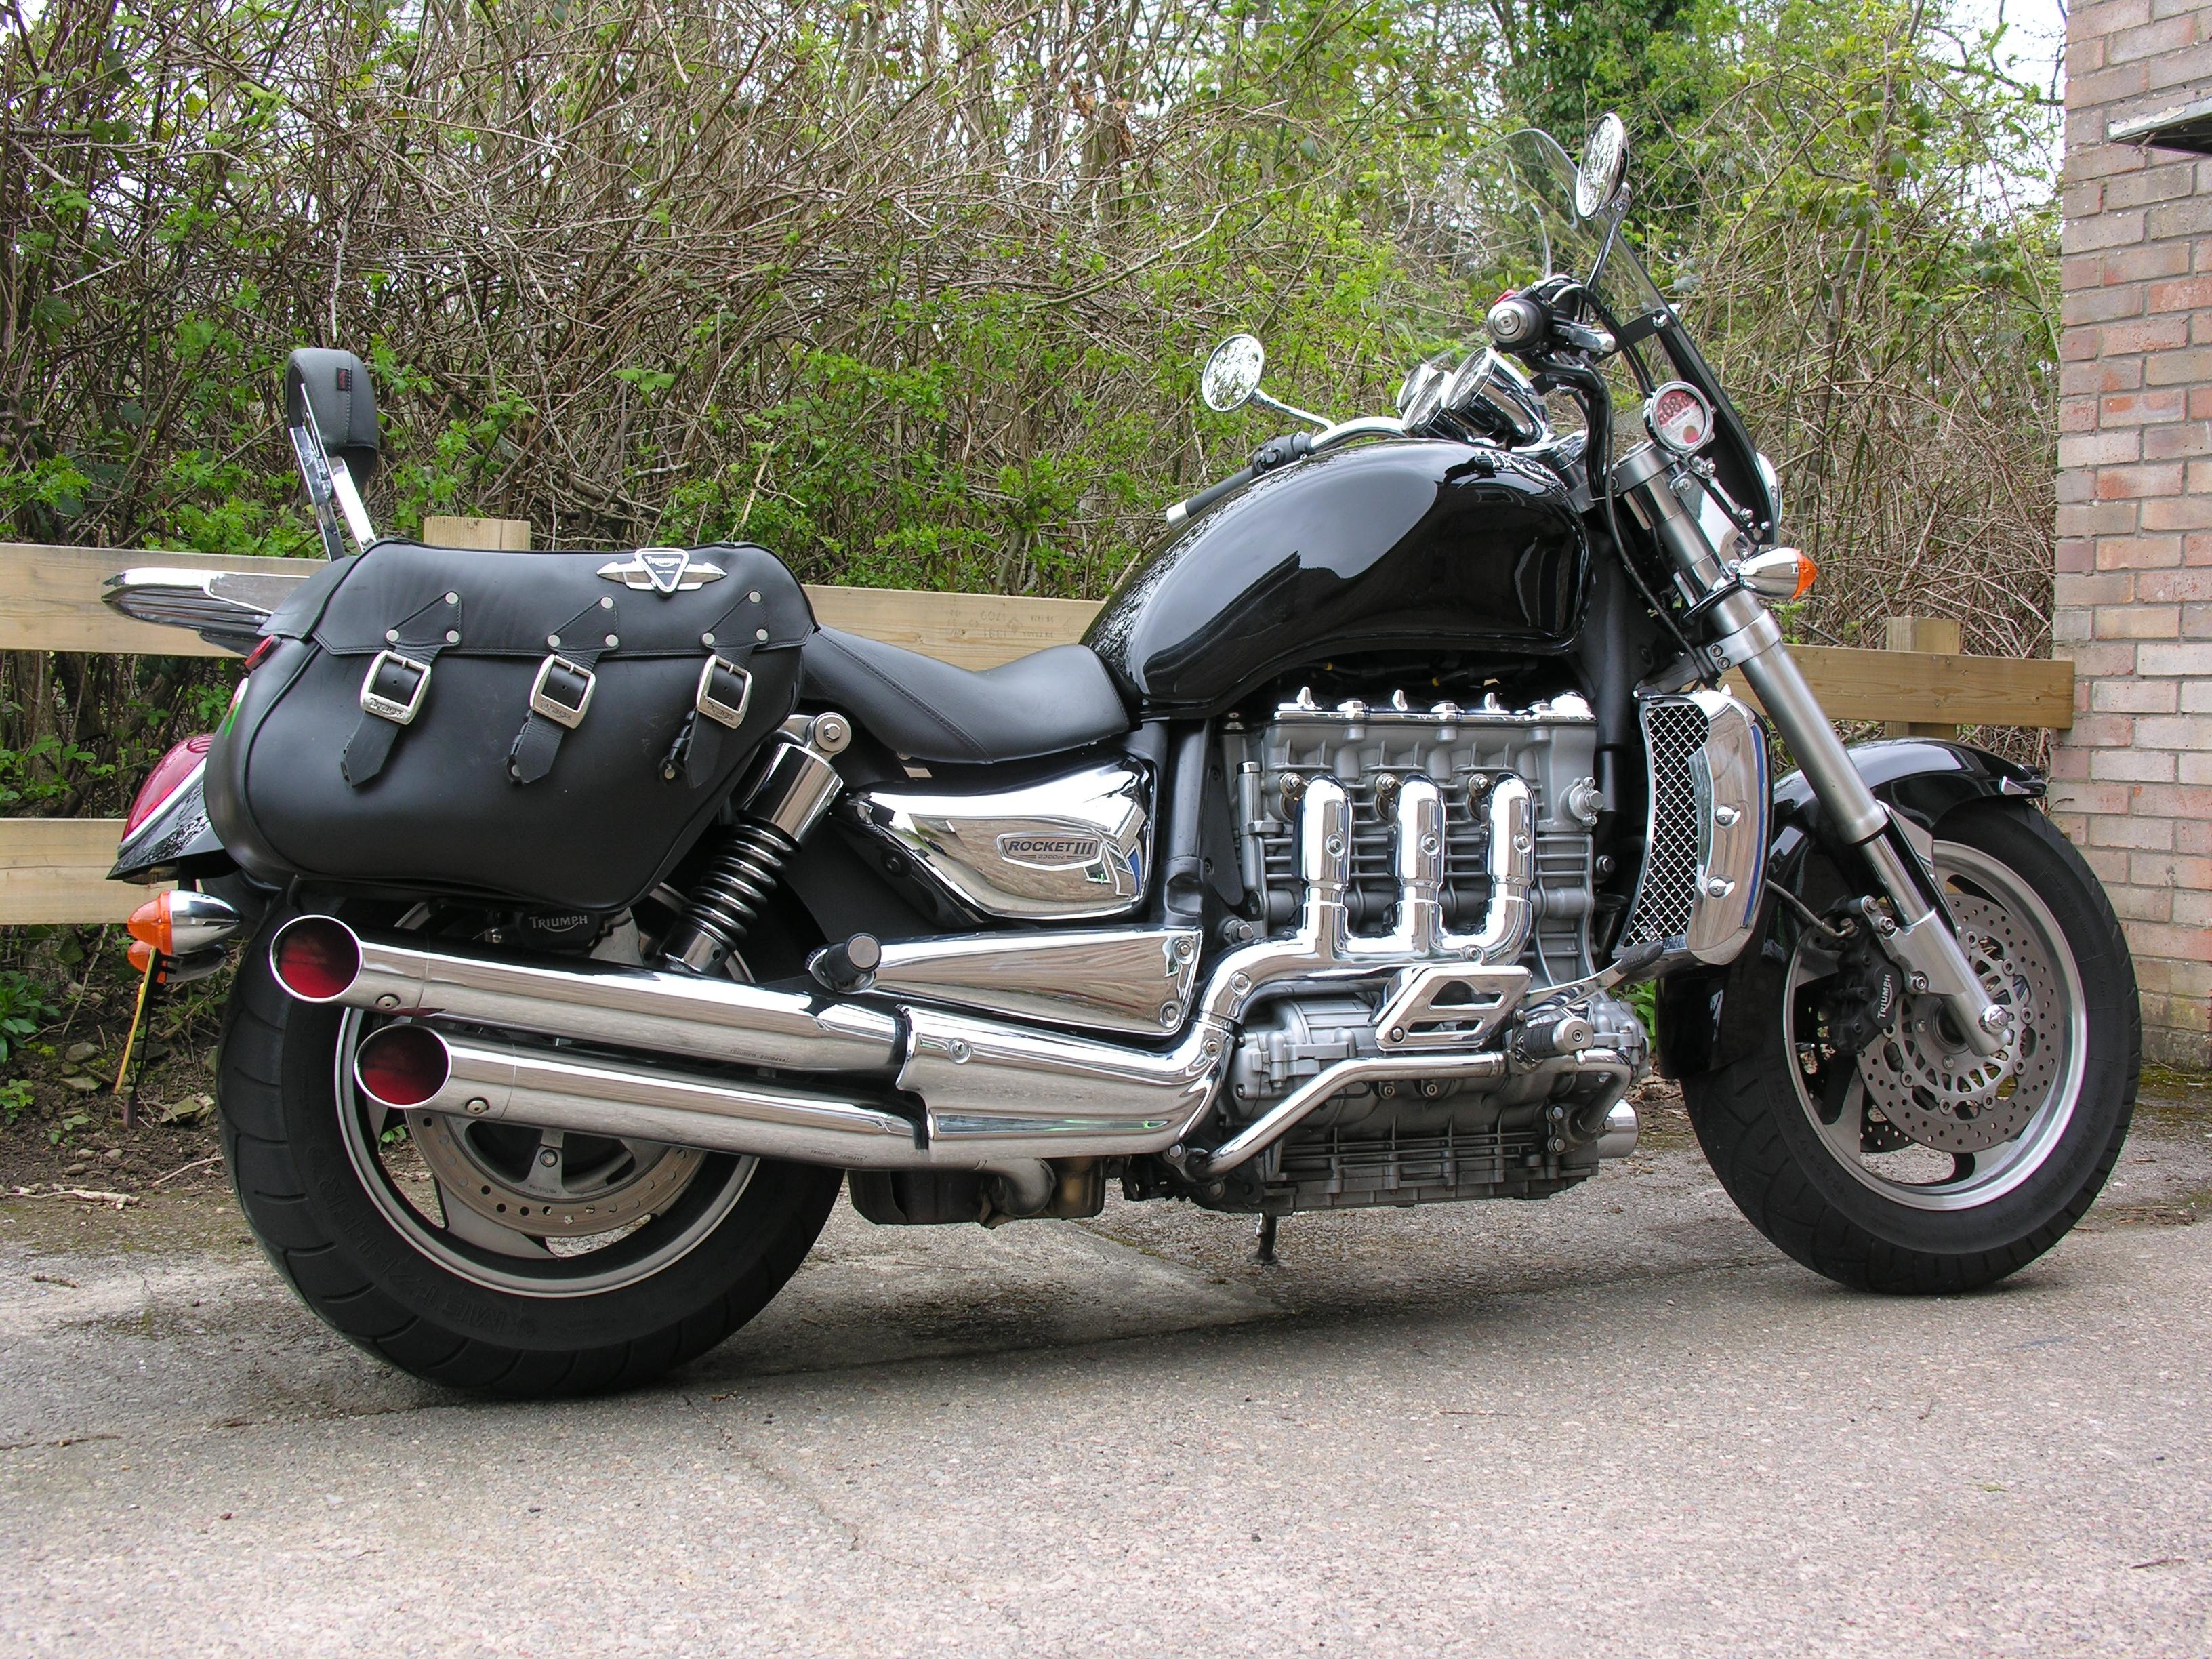 The Triumph Rocket Iii Triumph Motorcycles Ltd Uk The